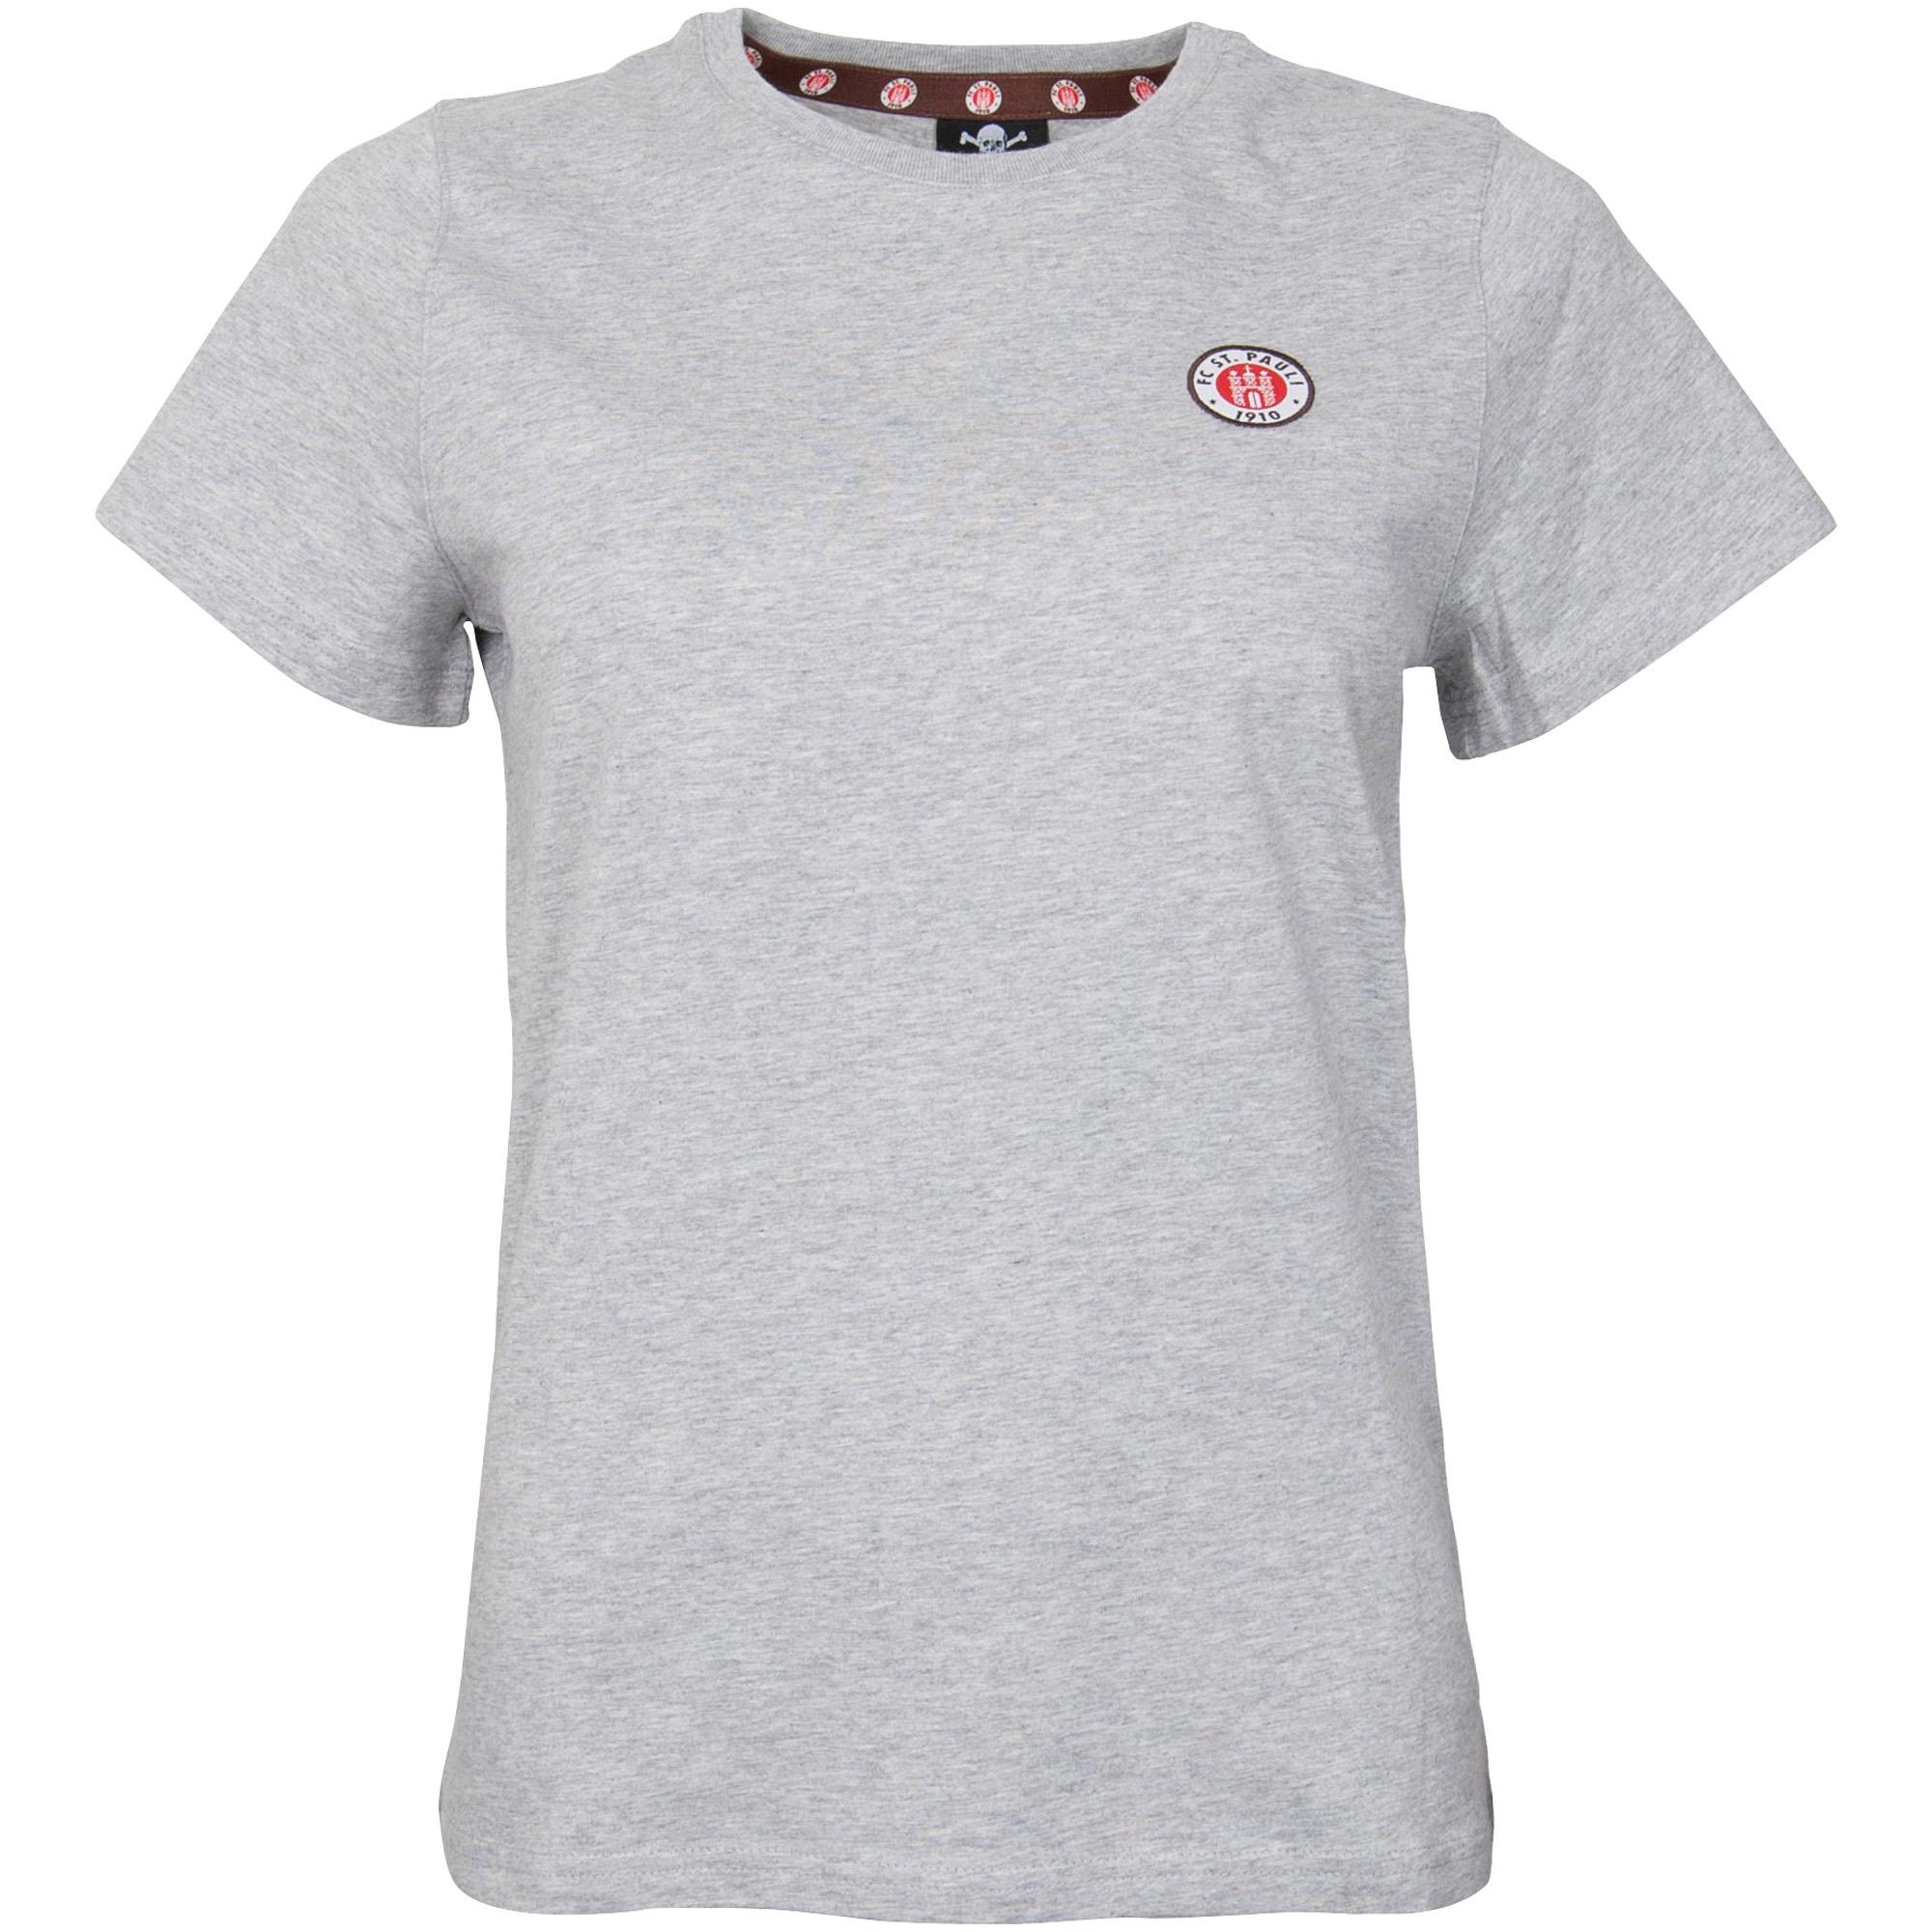 FC St. Pauli - Damen T-Shirt Club mit Logo - grau